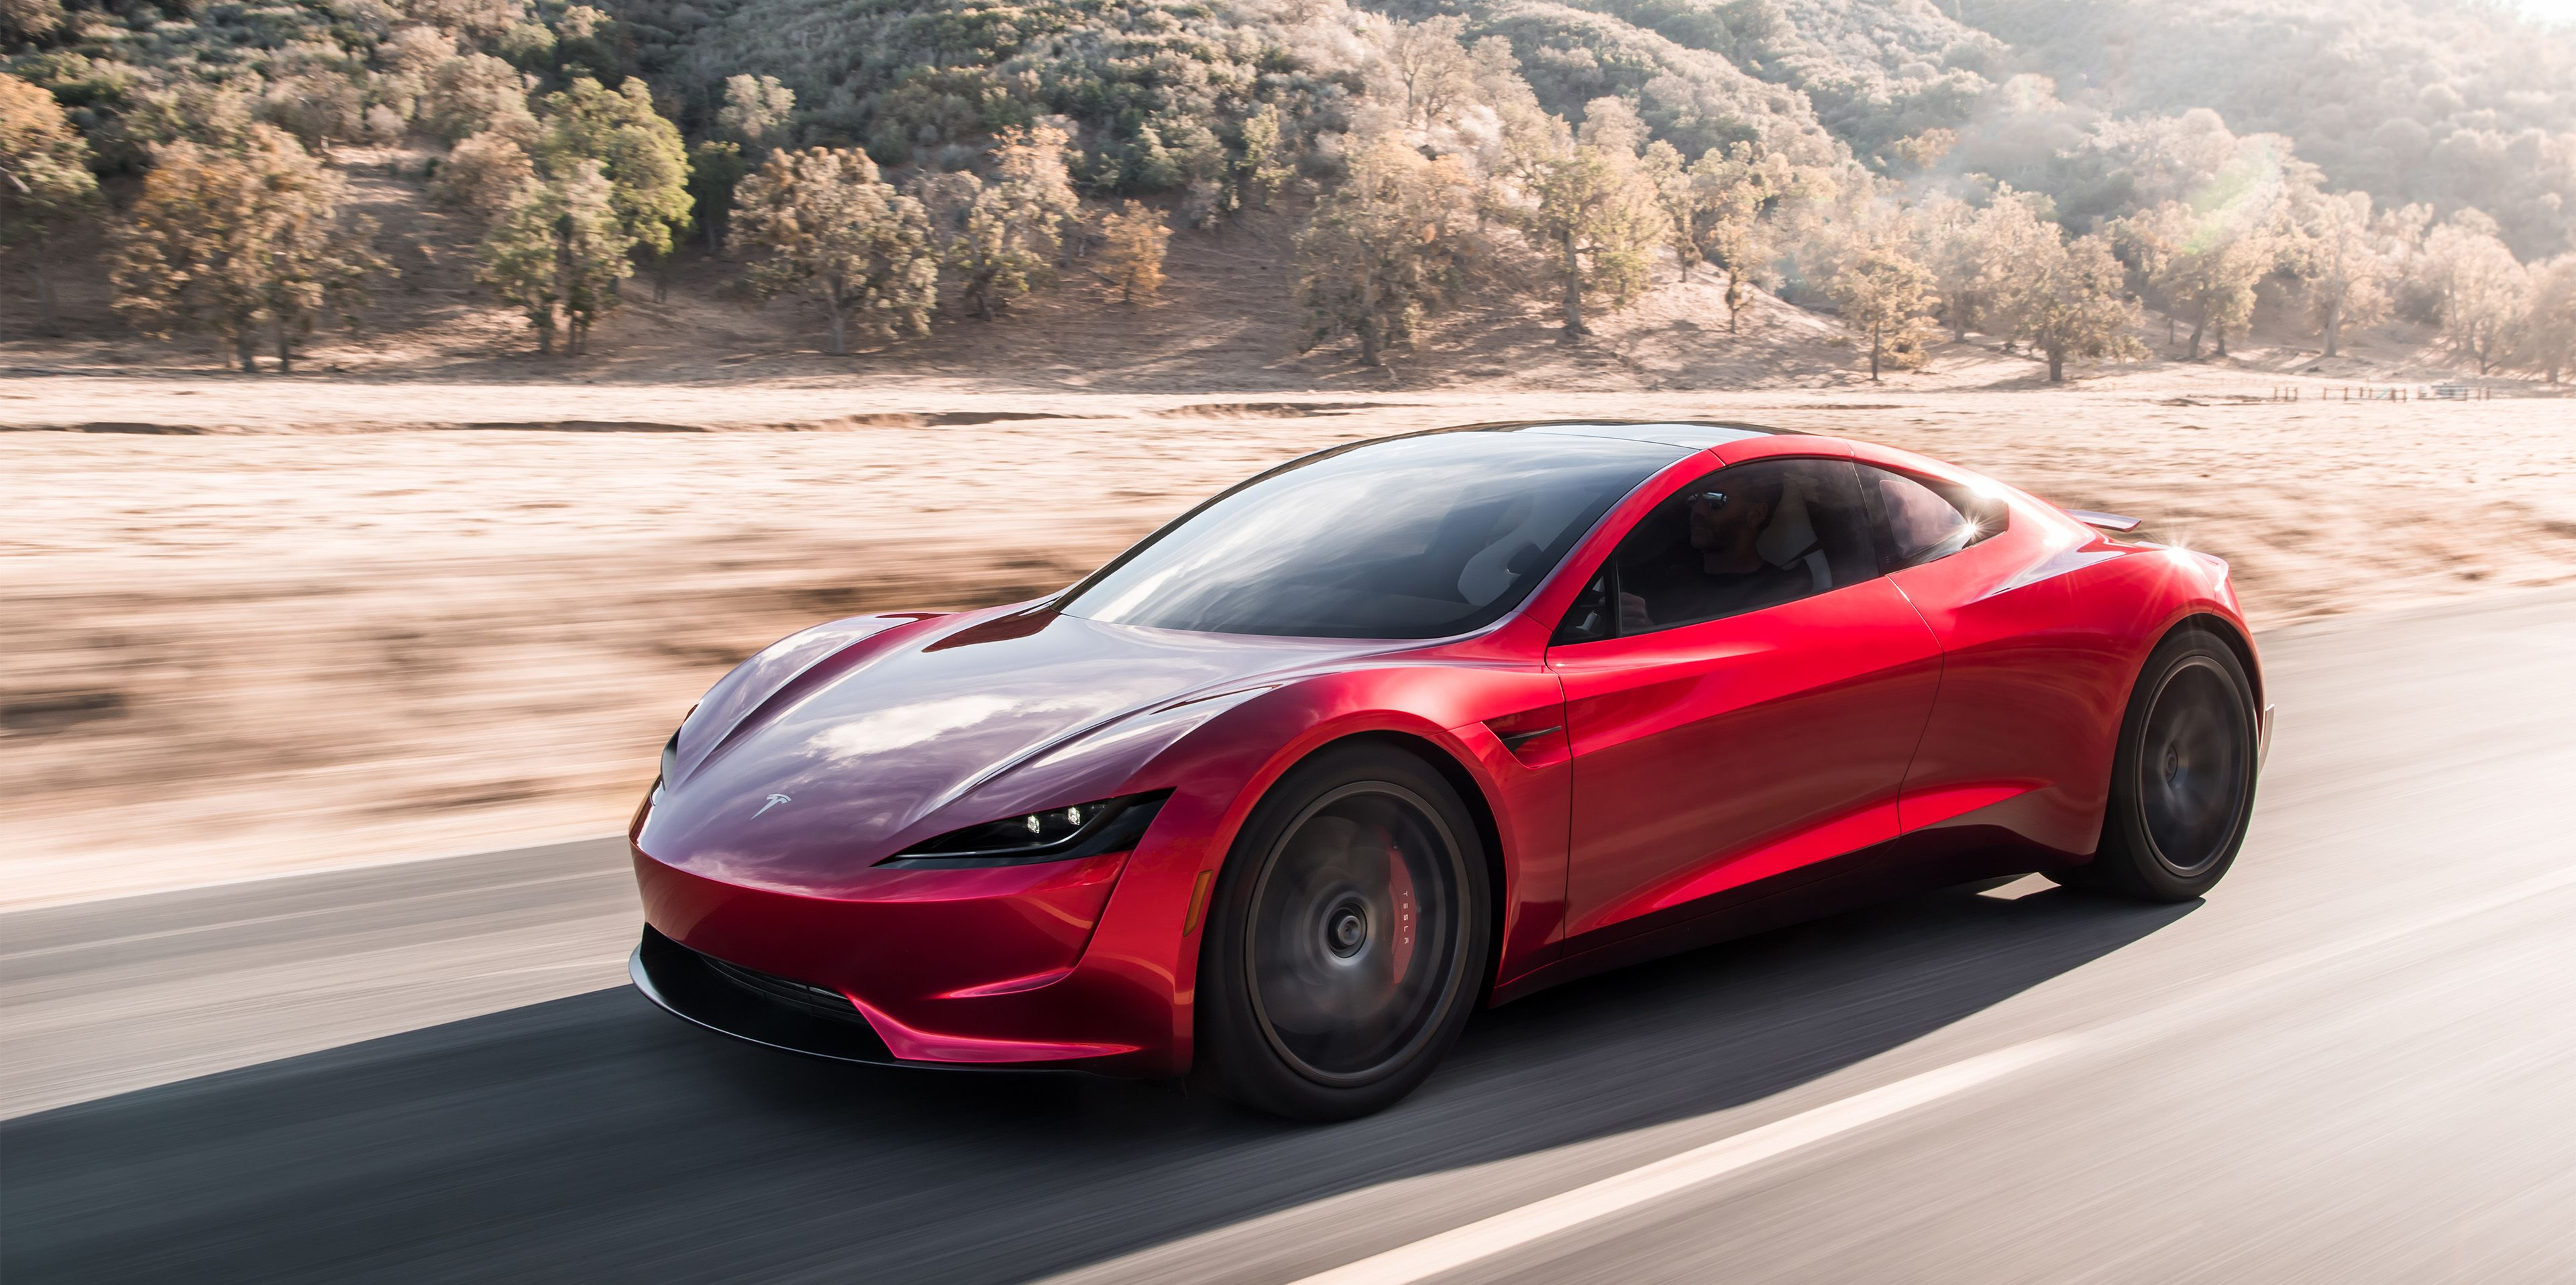 New Tesla Roadster Elon Musk Unveils Roadster As World S Quickest Car